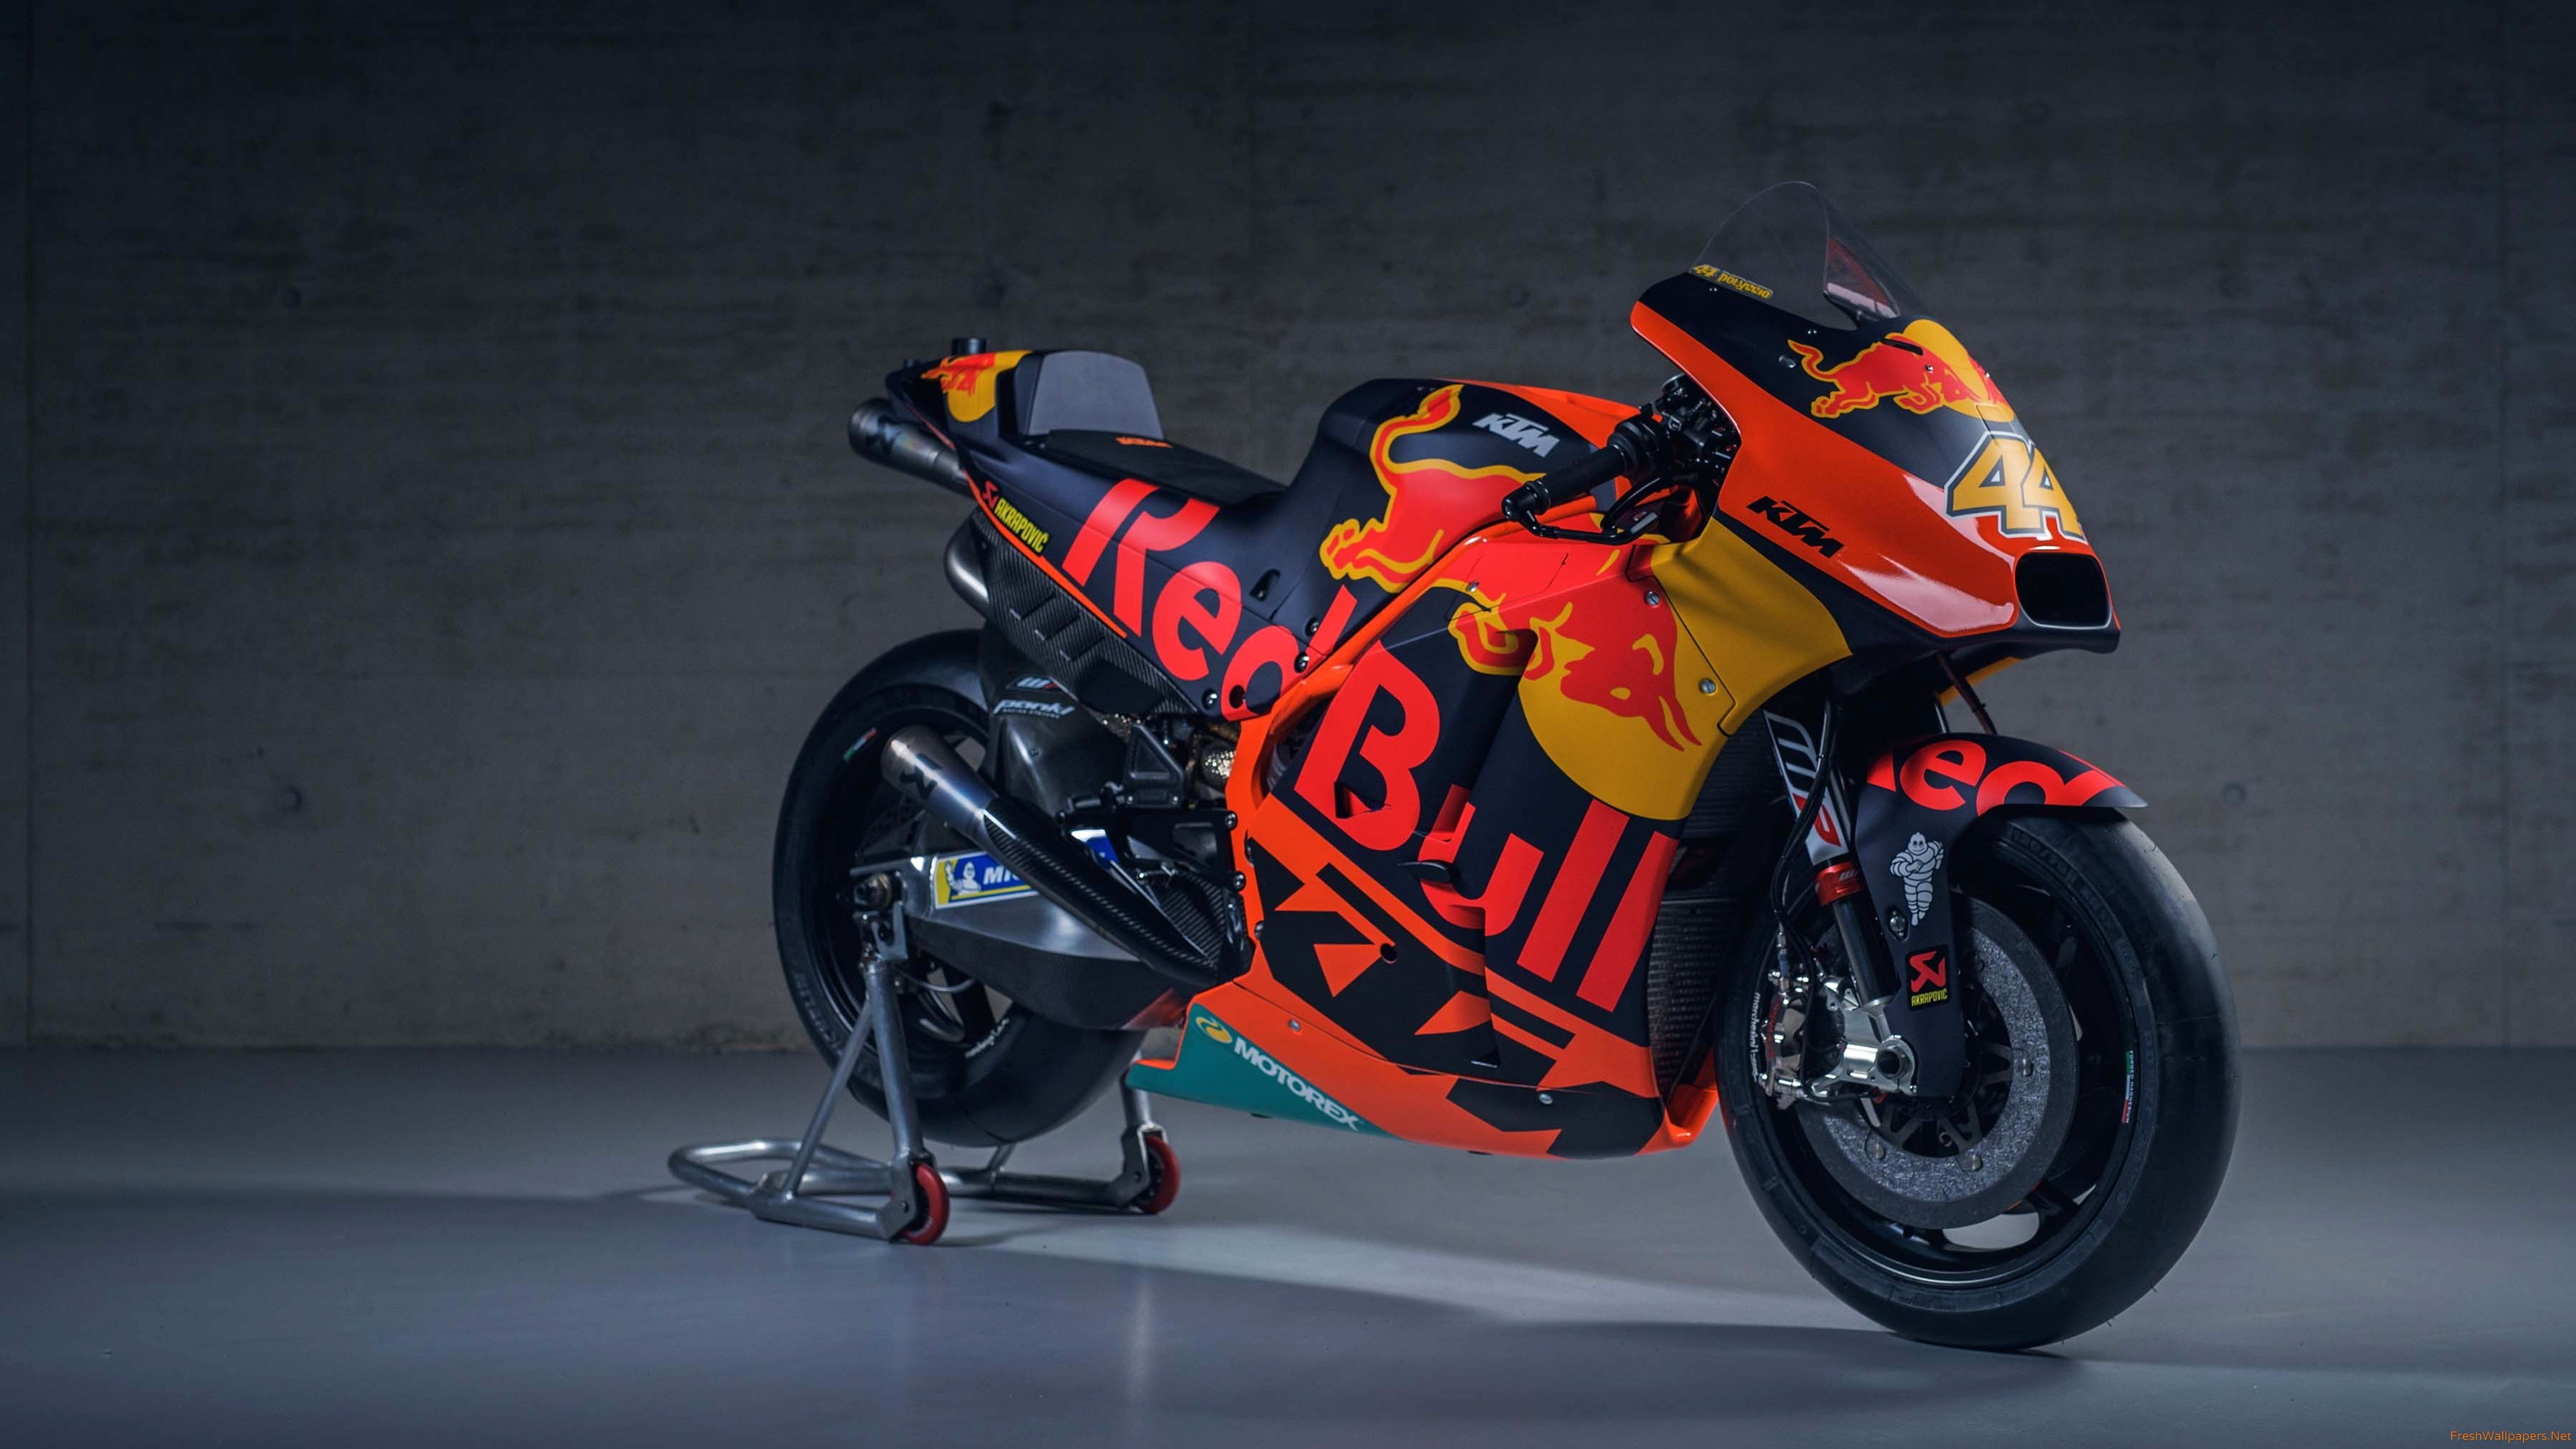 2019 KTM MotoGP 4K wallpapers Freshwallpapers 3840x2160